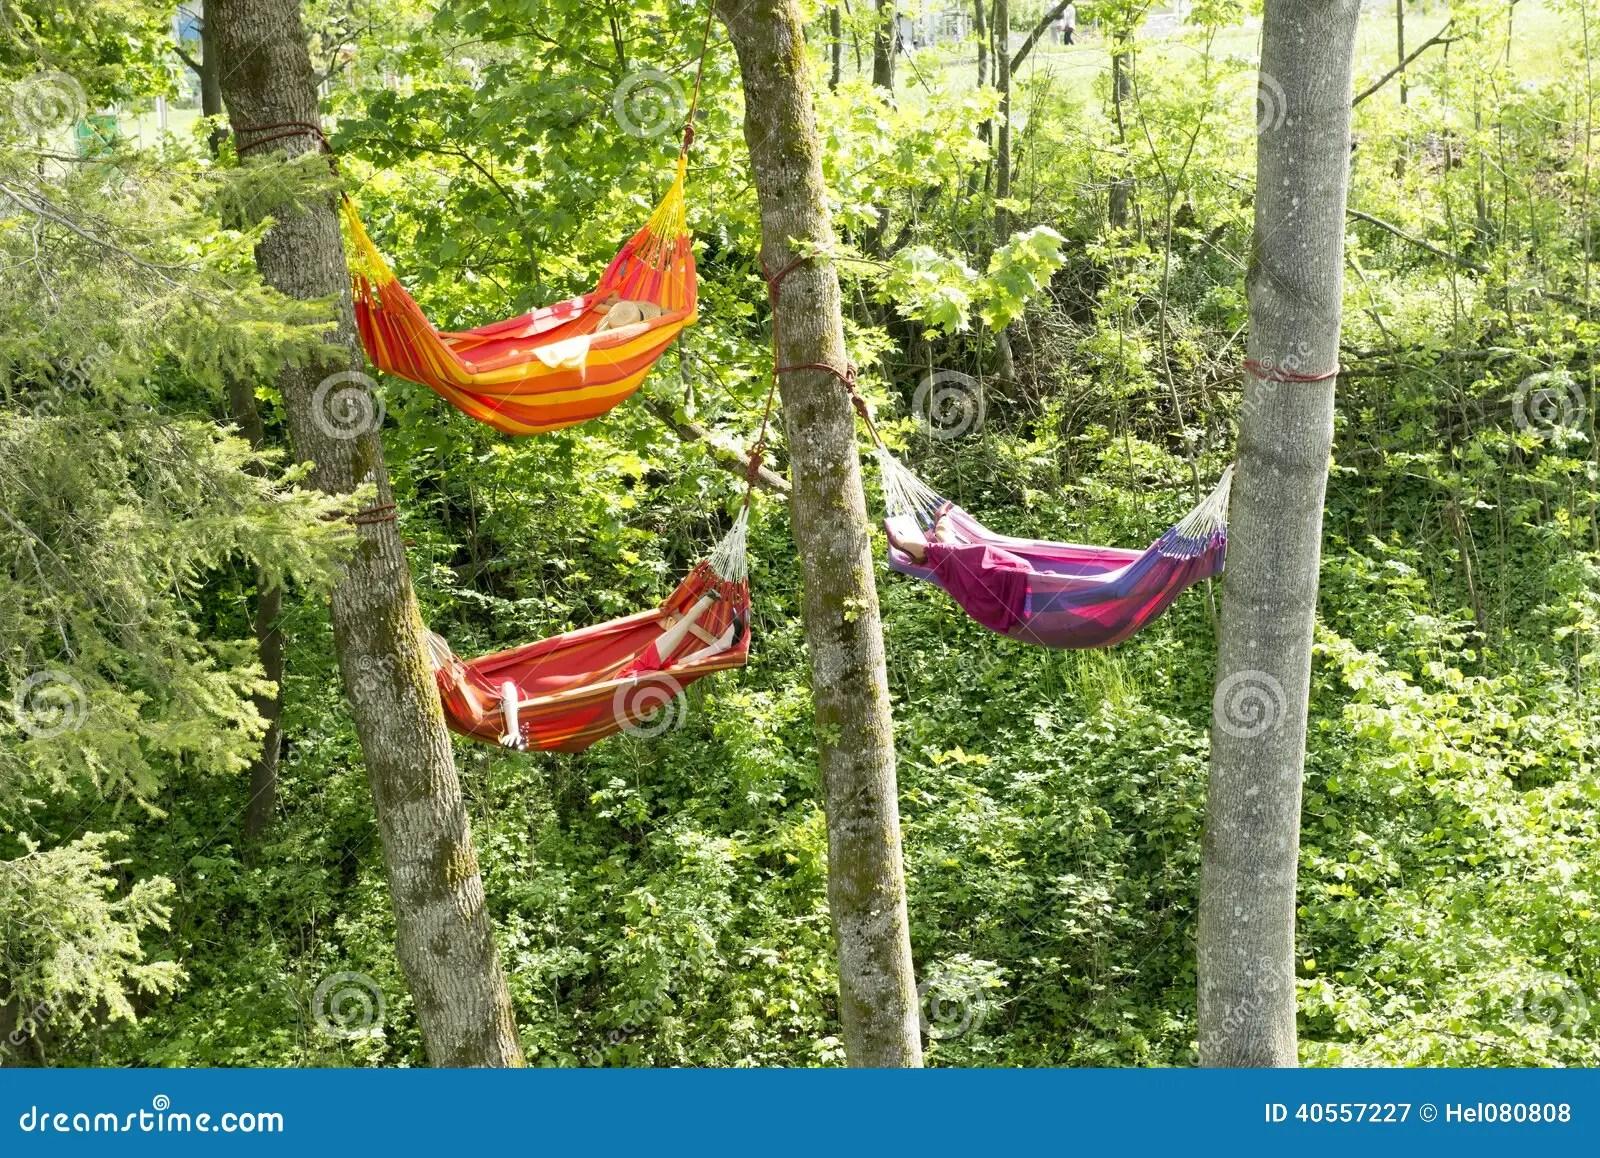 hammocks between trees stock